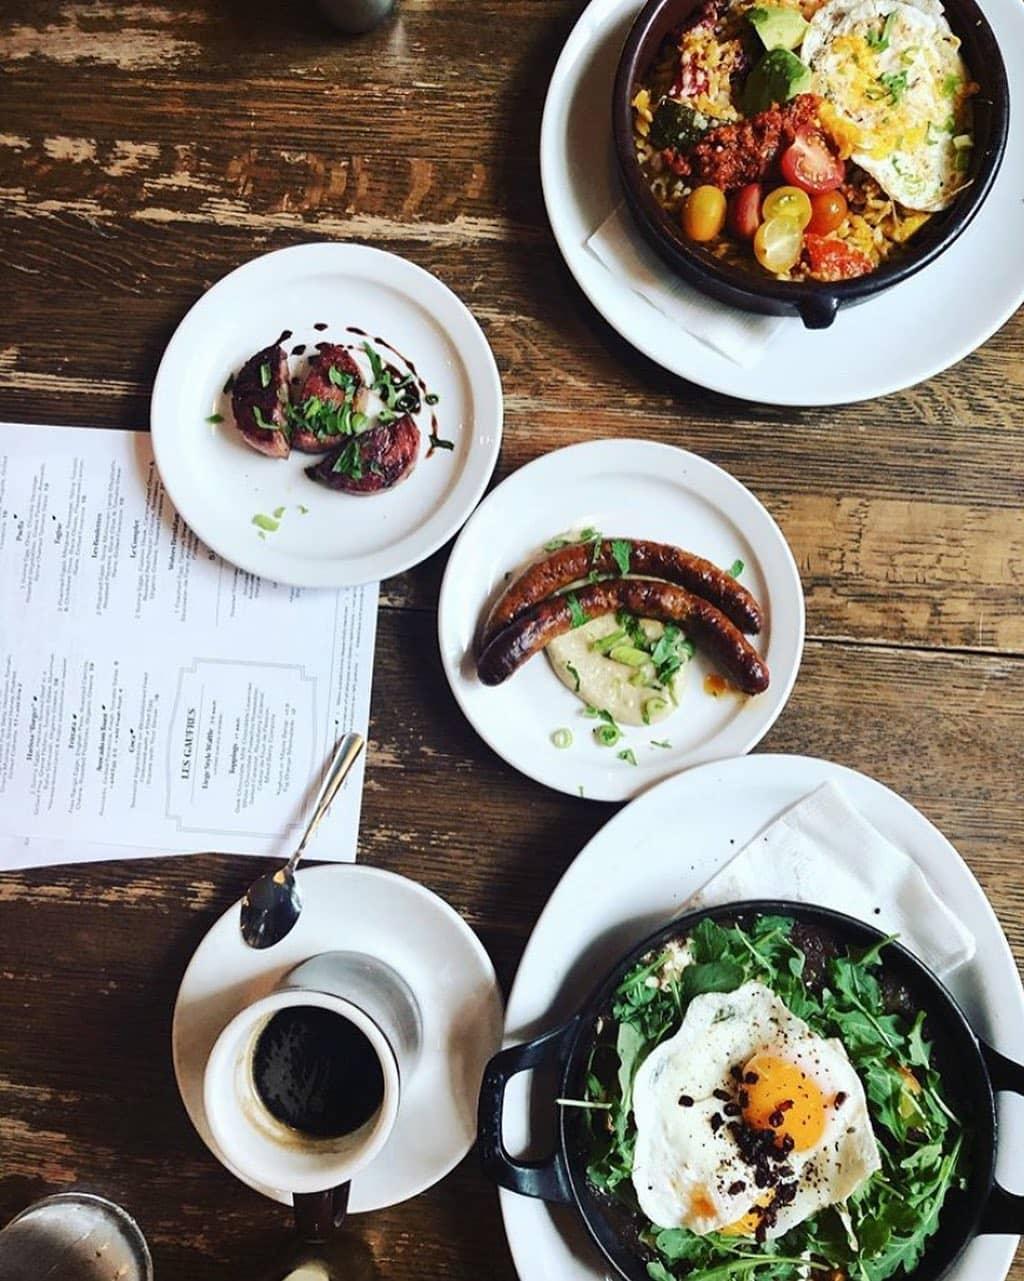 egg benedict brunch plates wooden table